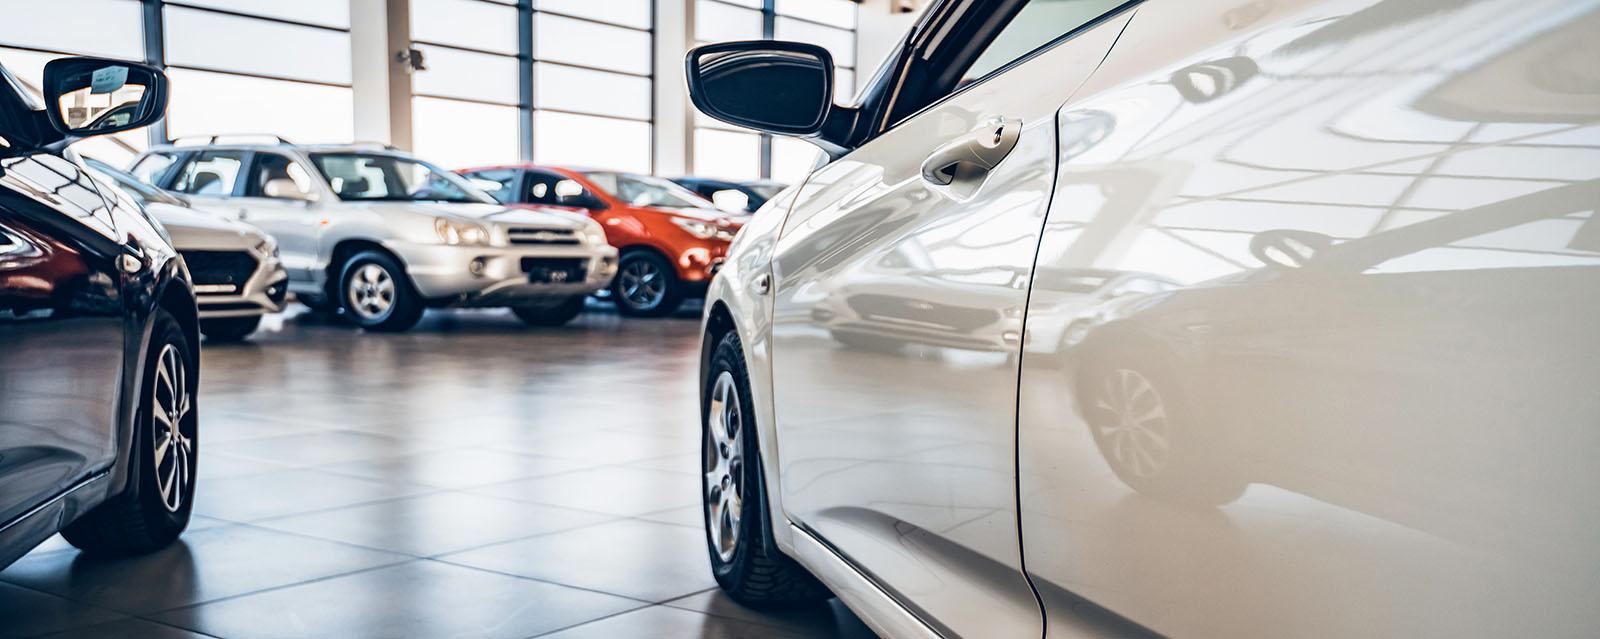 Kontakta Haninge Bilpark när du ska sälja bil i Göteborg